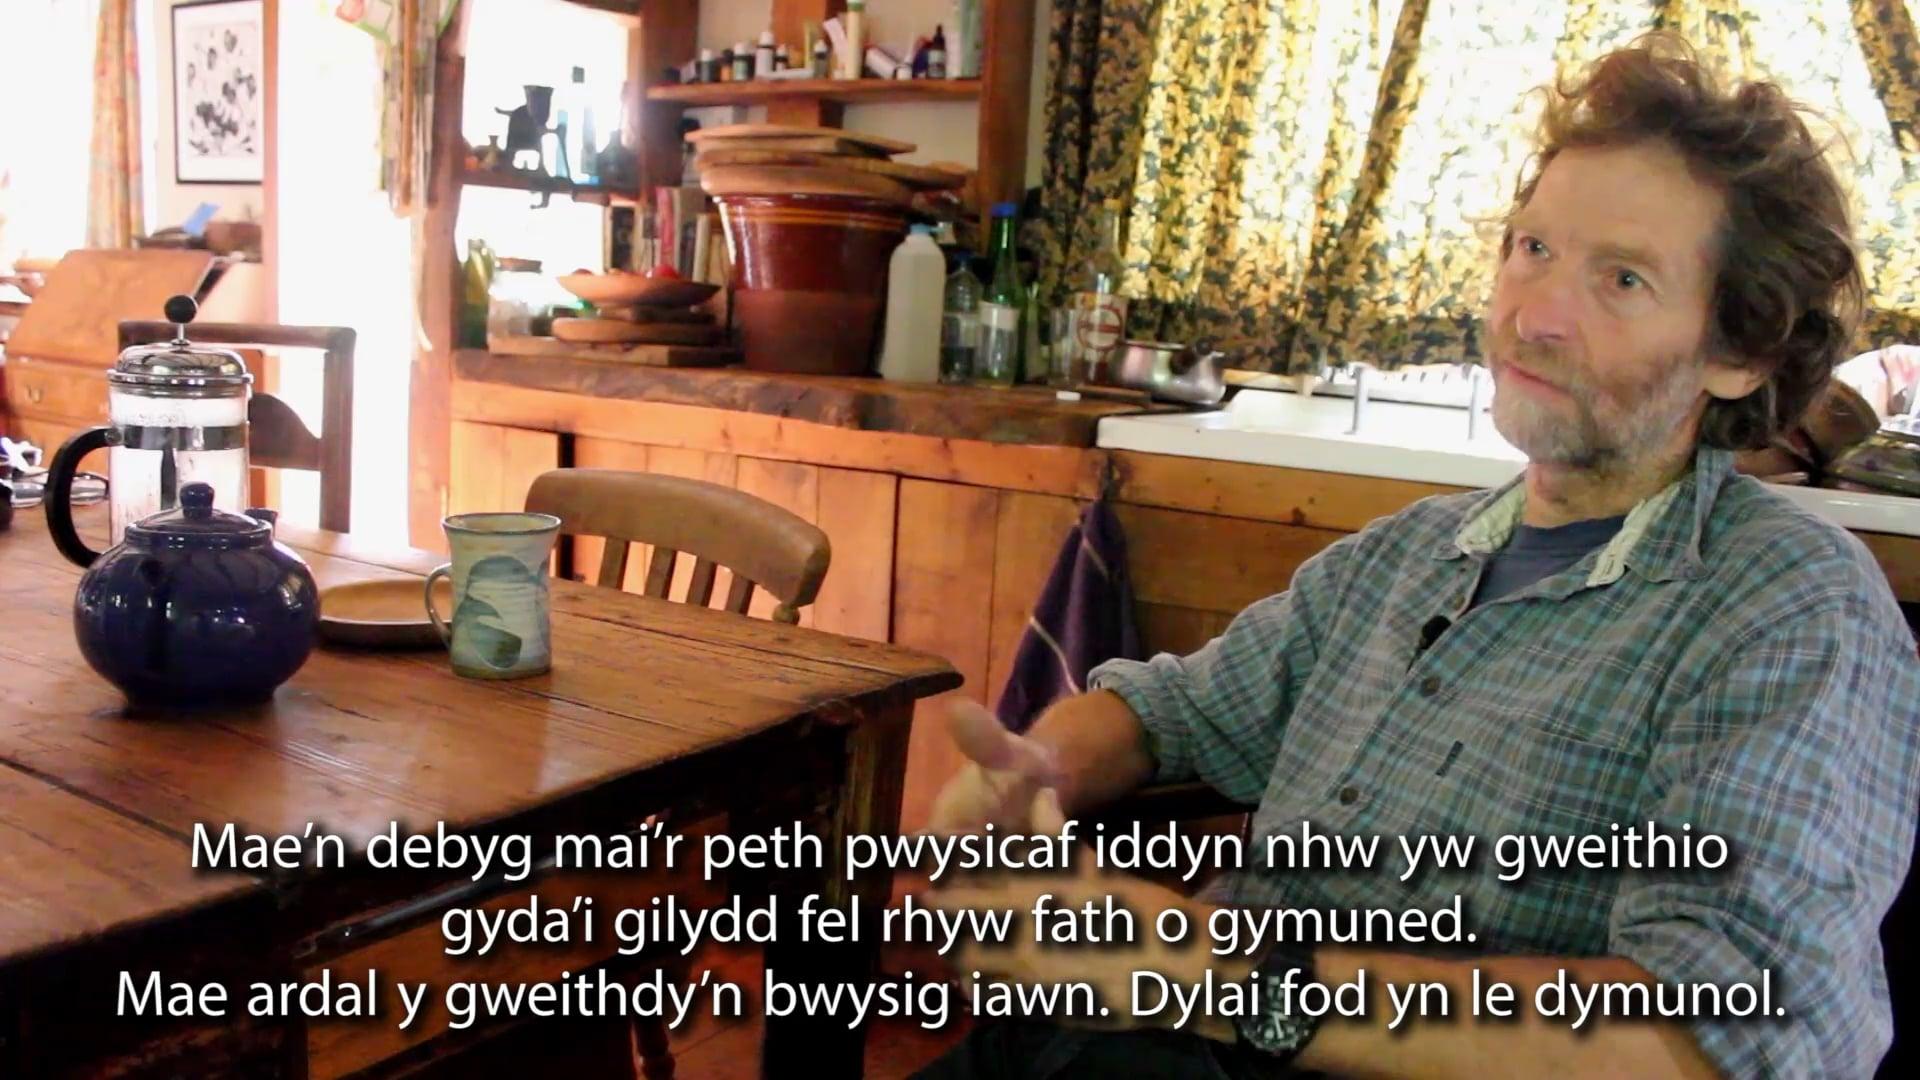 Elwy Working Woods - Welsh subtitles